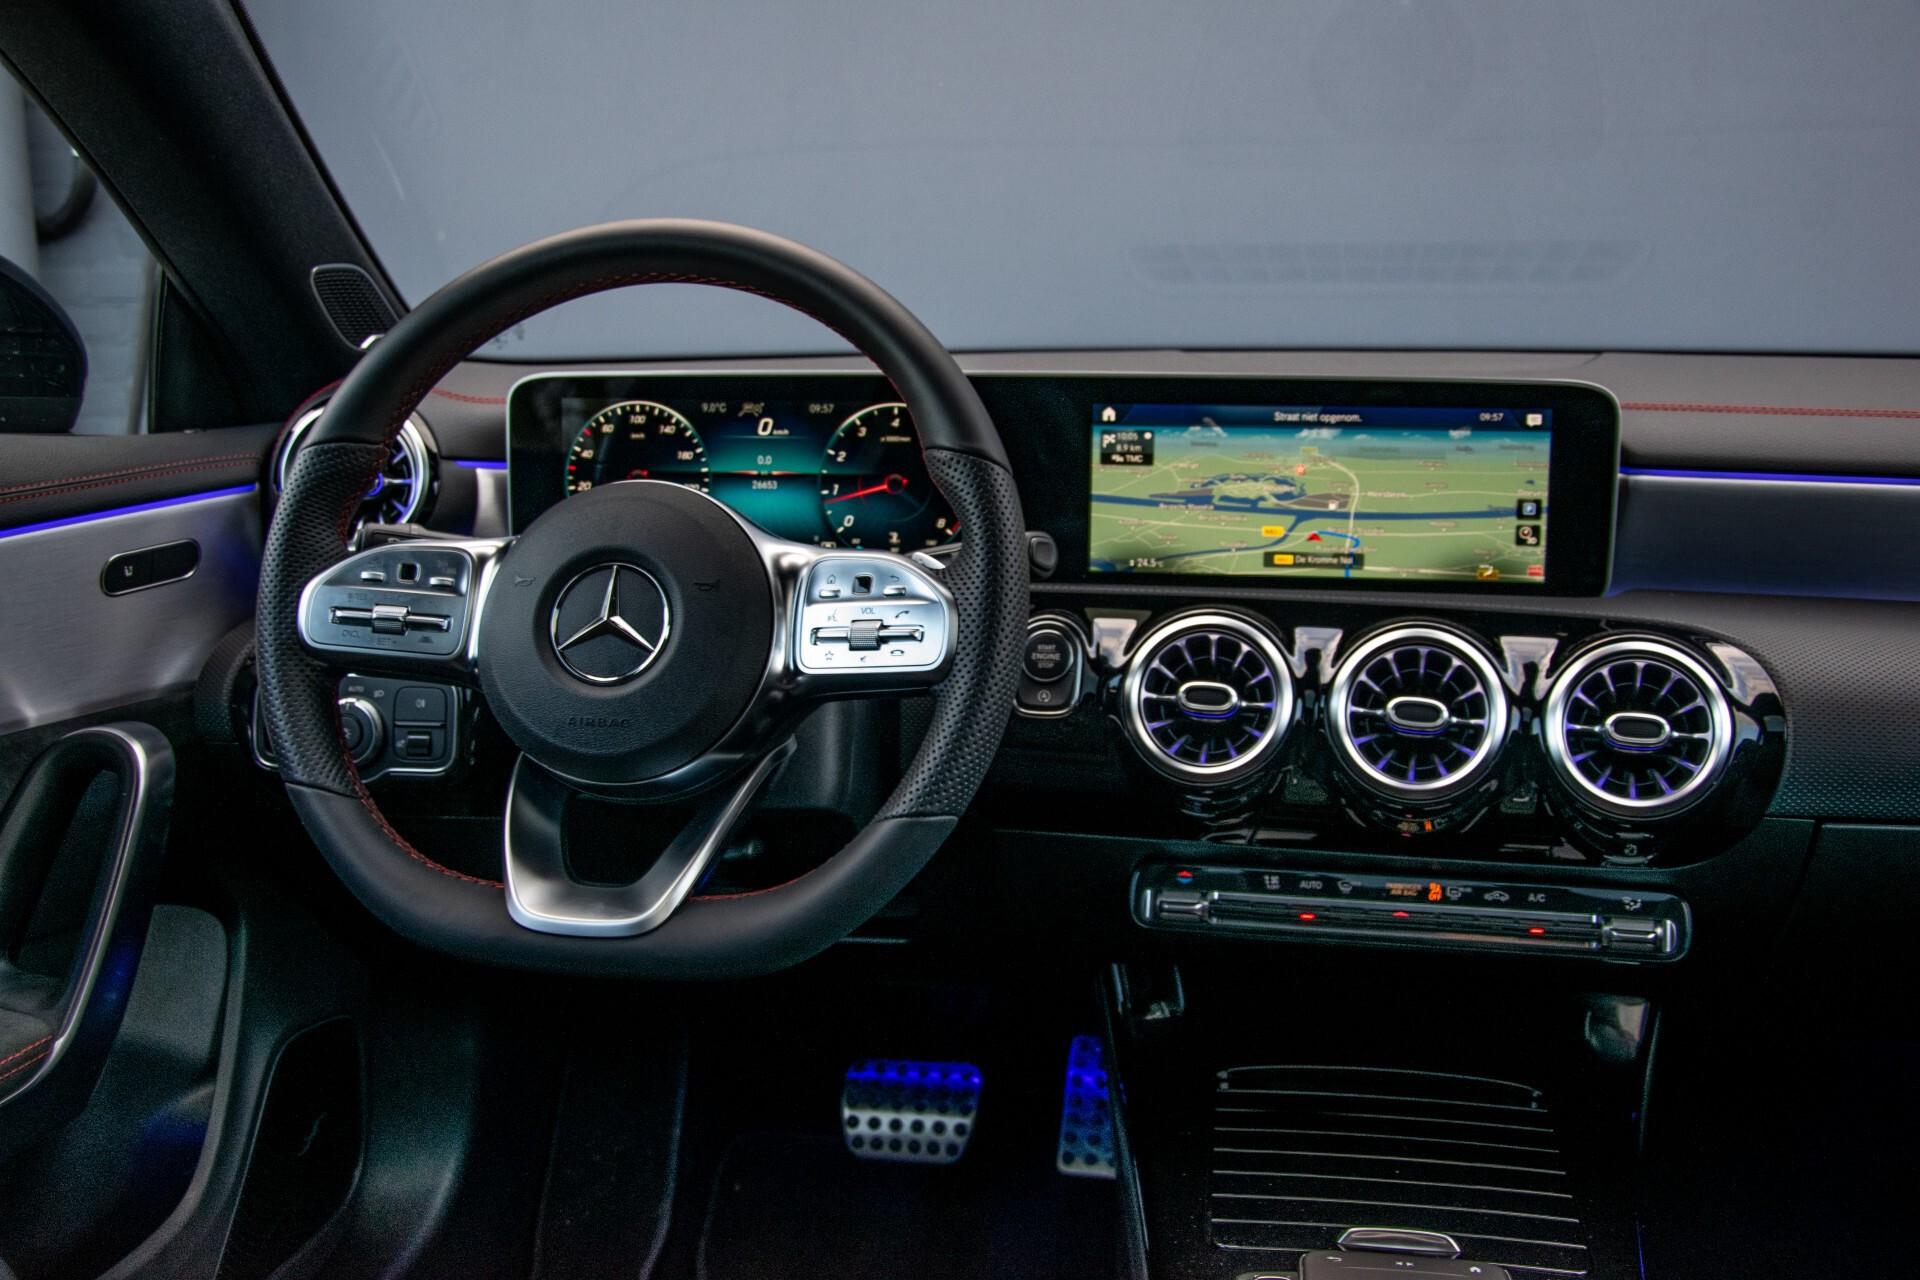 Mercedes-Benz CLA-Klasse Shooting Brake 250 AMG Panorama/Rij-assistentie/Burmester/Night Aut7 Foto 6